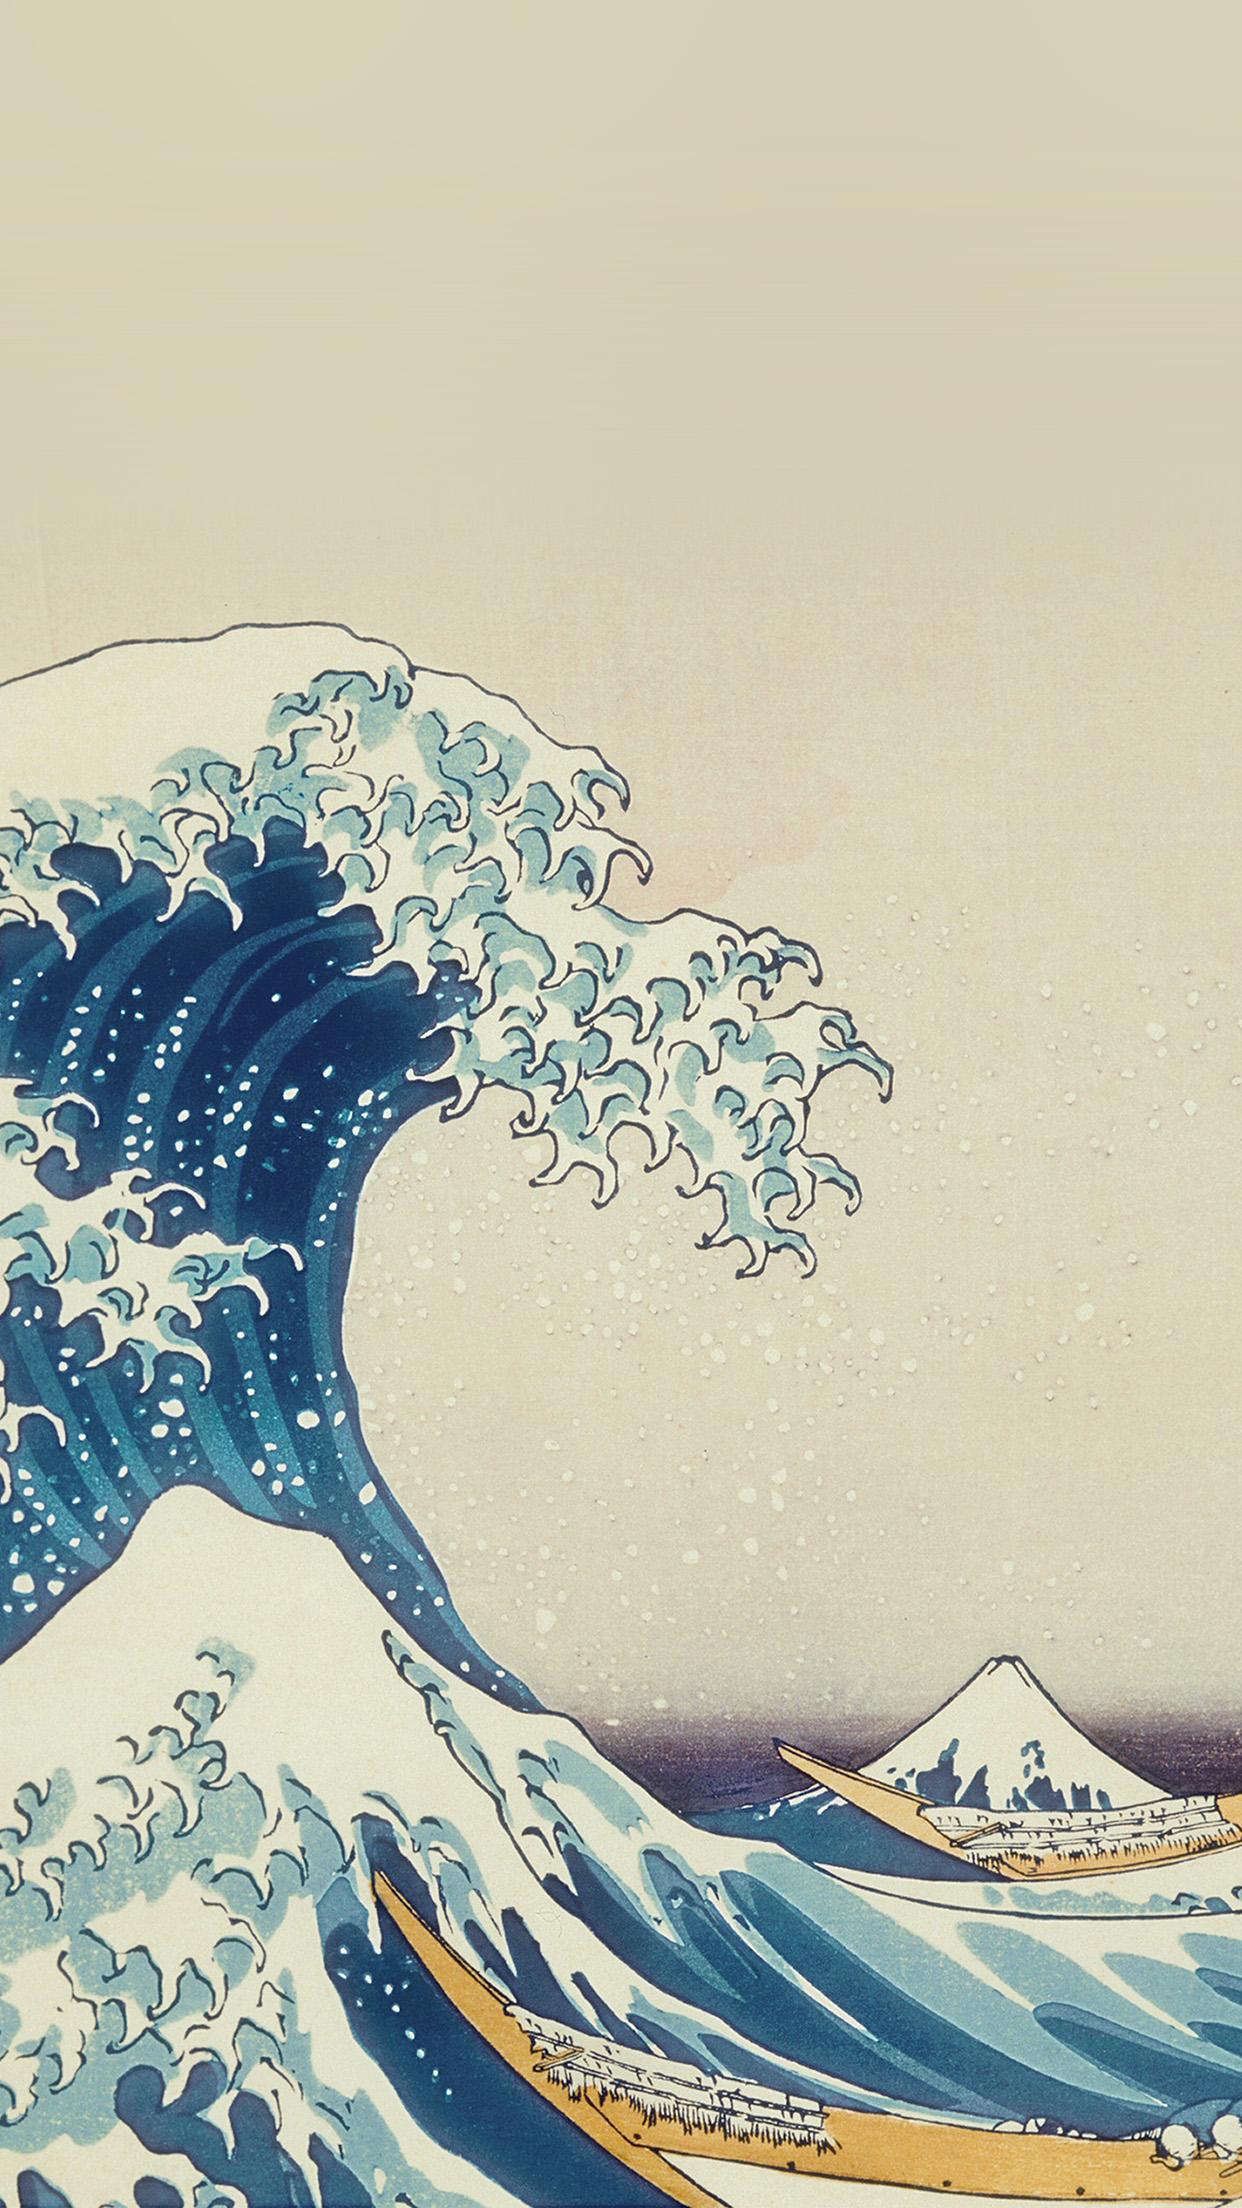 As11 Wave Art Hokusai Painting Classic Art Illustration Wallpaper